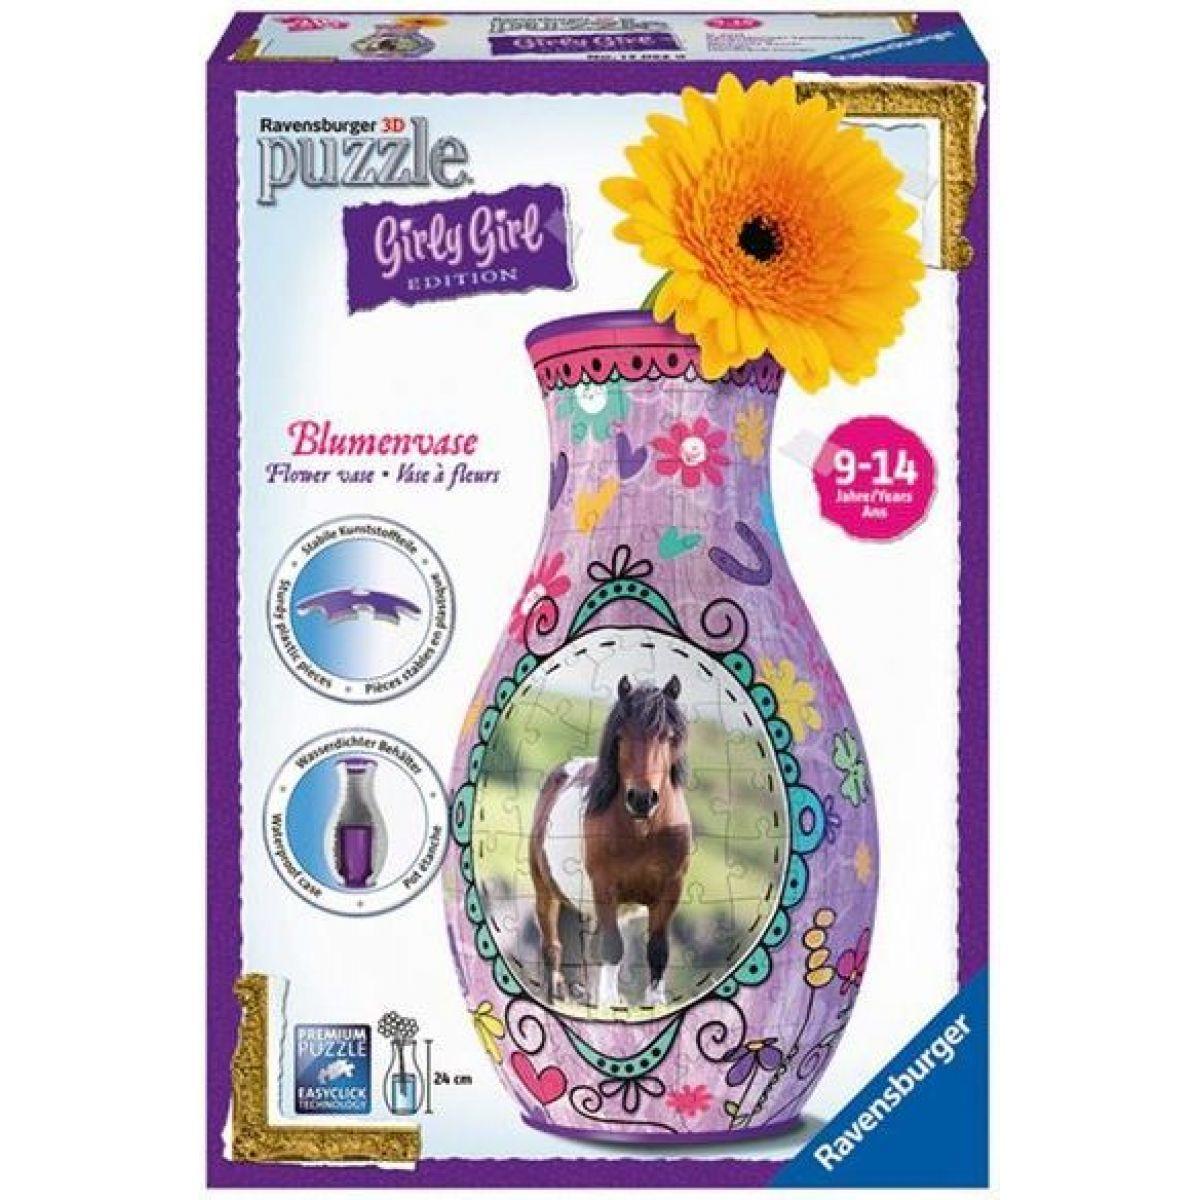 Ravensburger Puzzle 3D Girly Girl Váza - Kůň